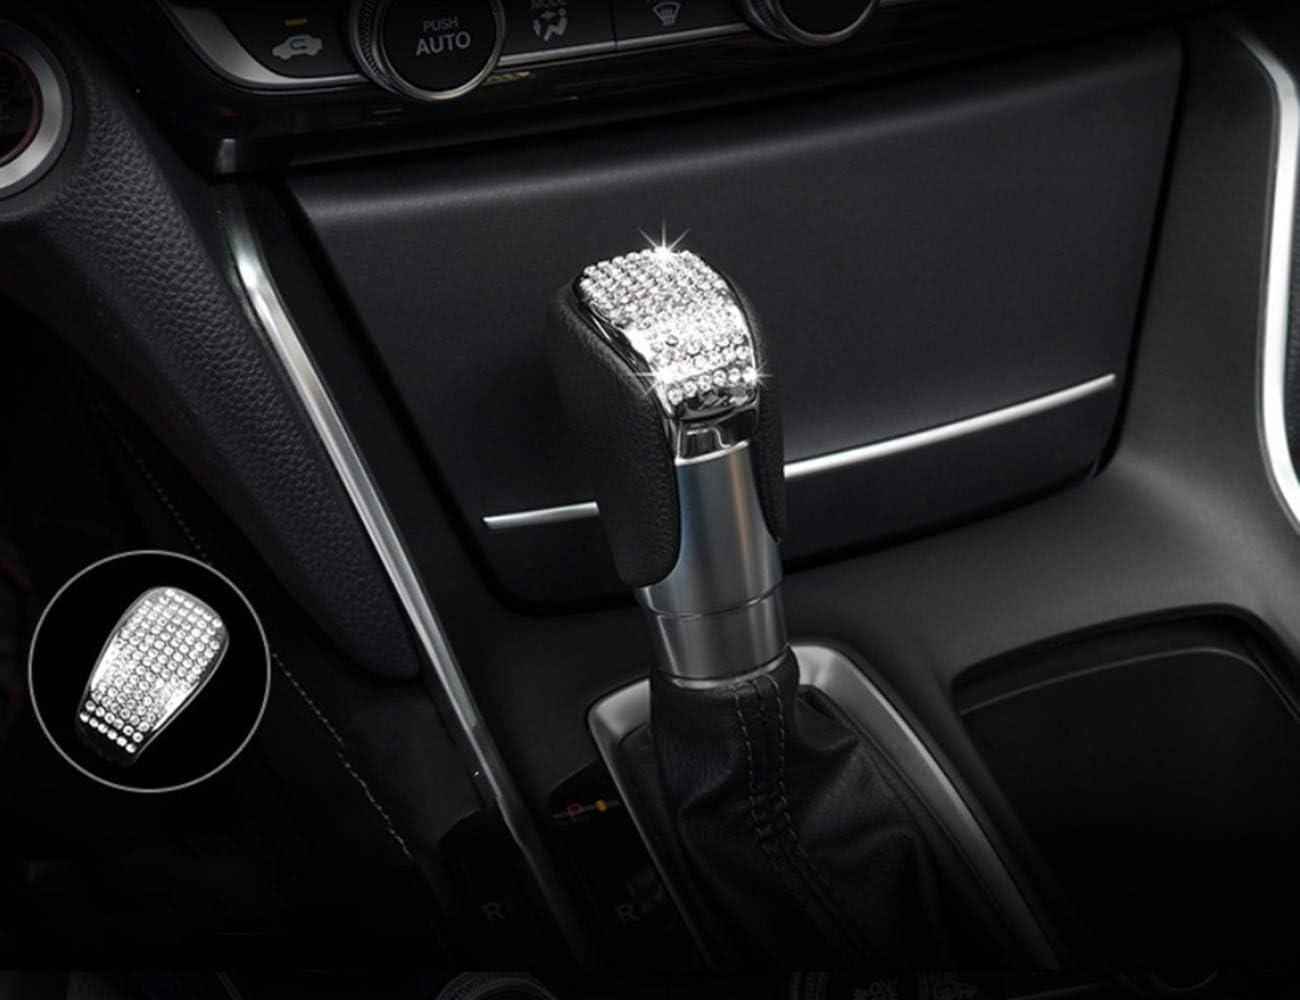 HAILWH Bling Interior Accessories Fit for Honda Accord Inspire Sport EX EX-L Touring Sedan 2018-2019 3D Rhinestone Knob Cover Applique Cover 1PC//Set Central Storage Box Decoration Strip